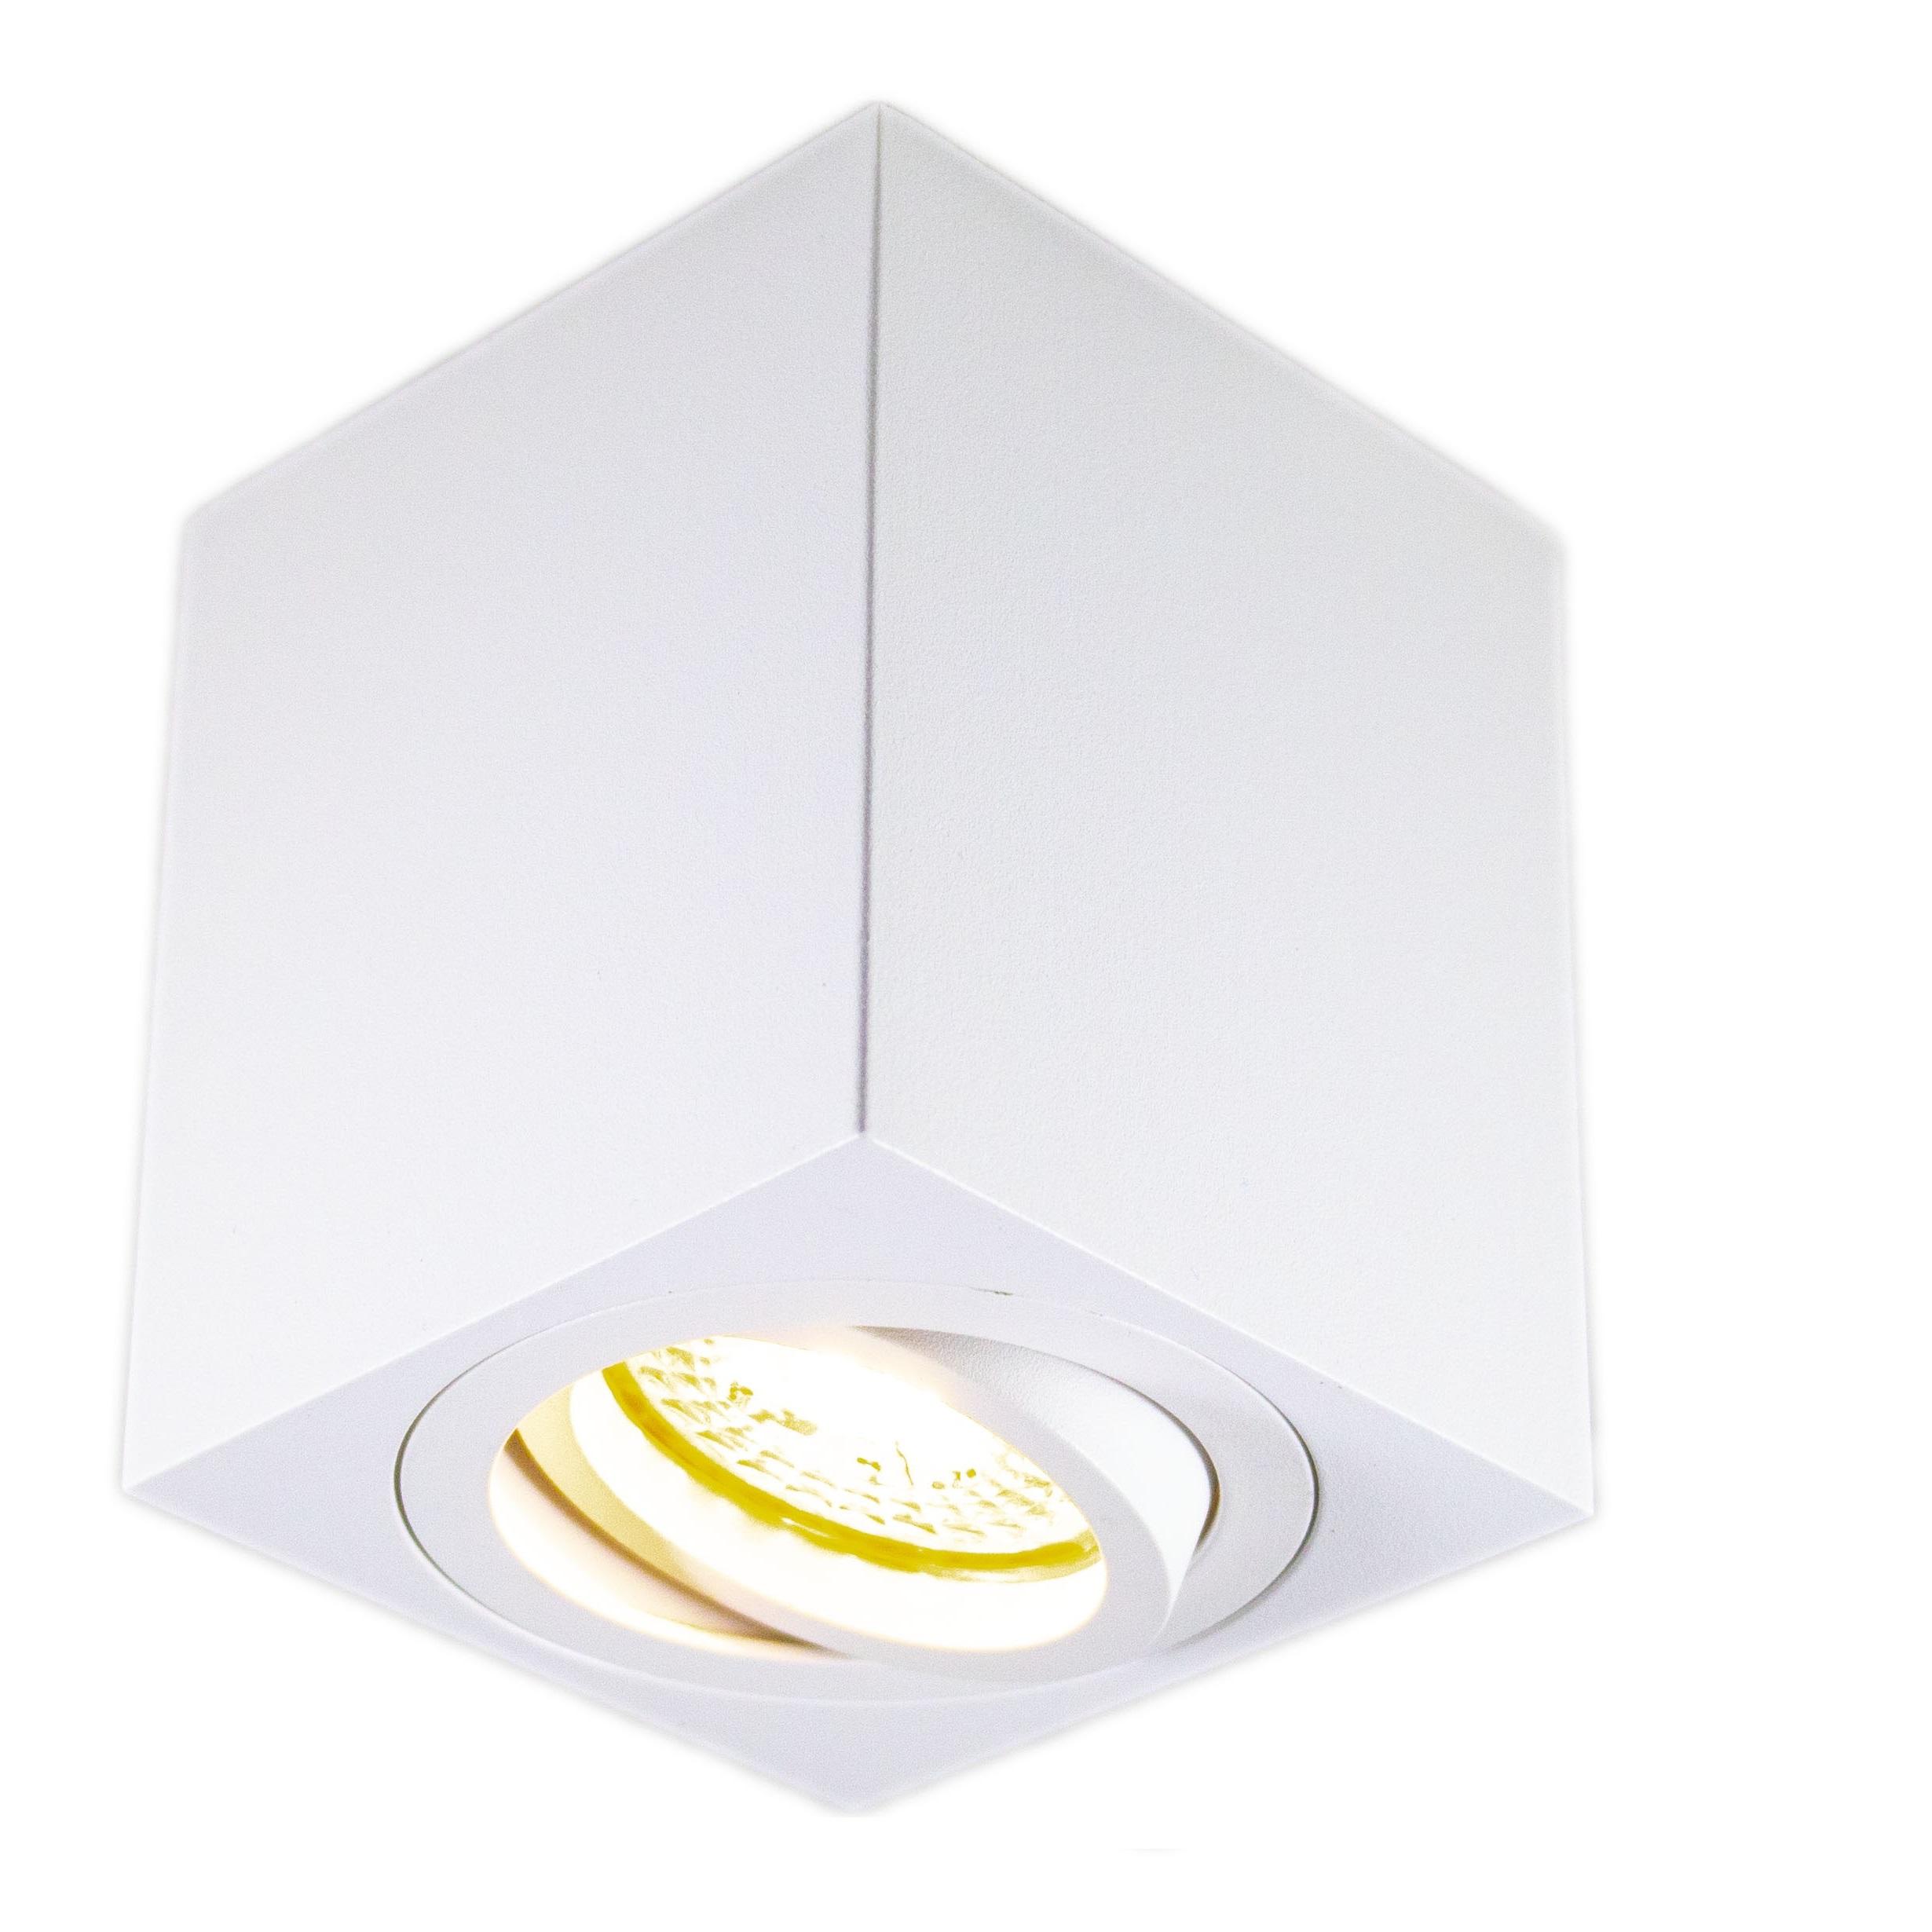 Opbouw spot armatuur wit vierkant kantelbaar GU10 fitting - spot aan gekanteld